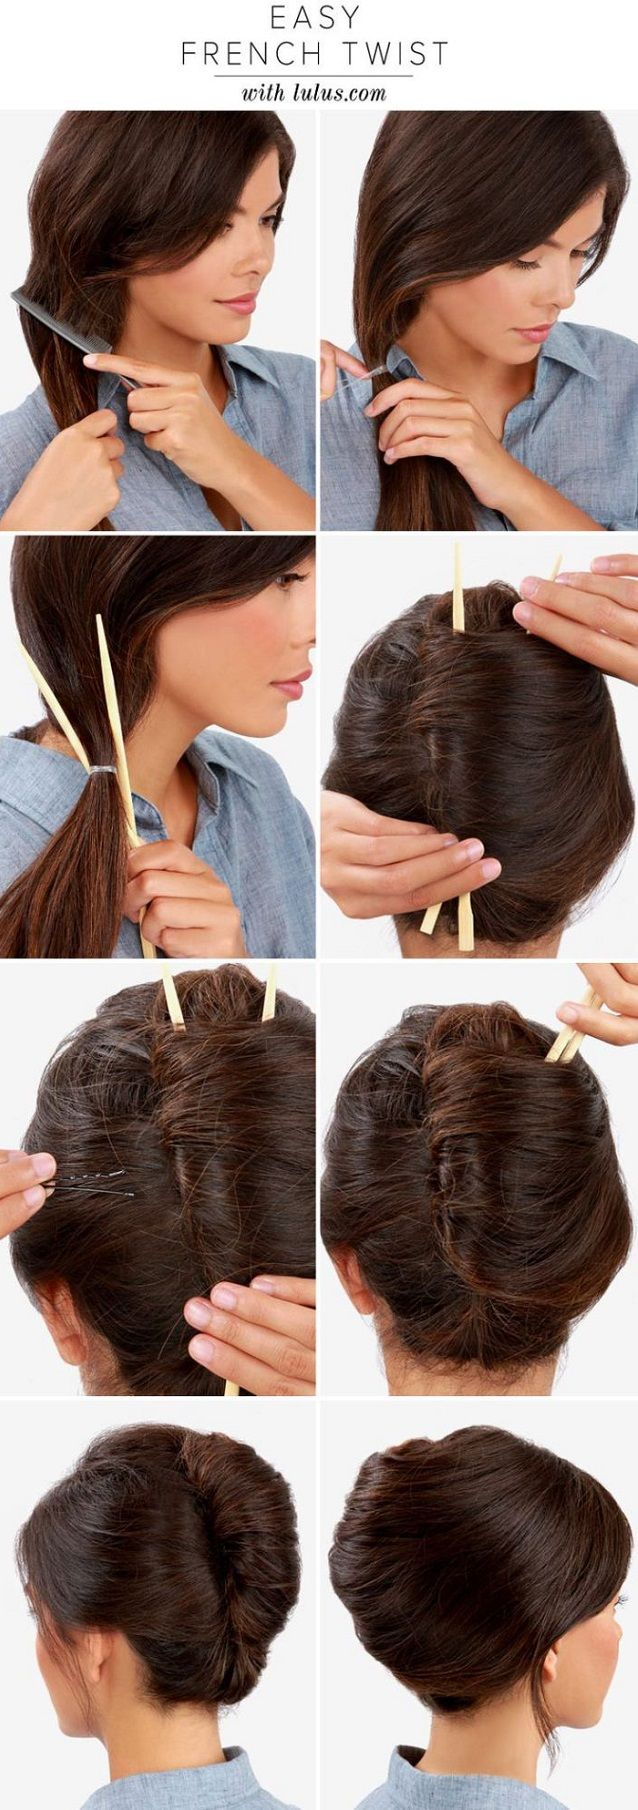 Make a French Twist Hairstyle Using Chopsticks